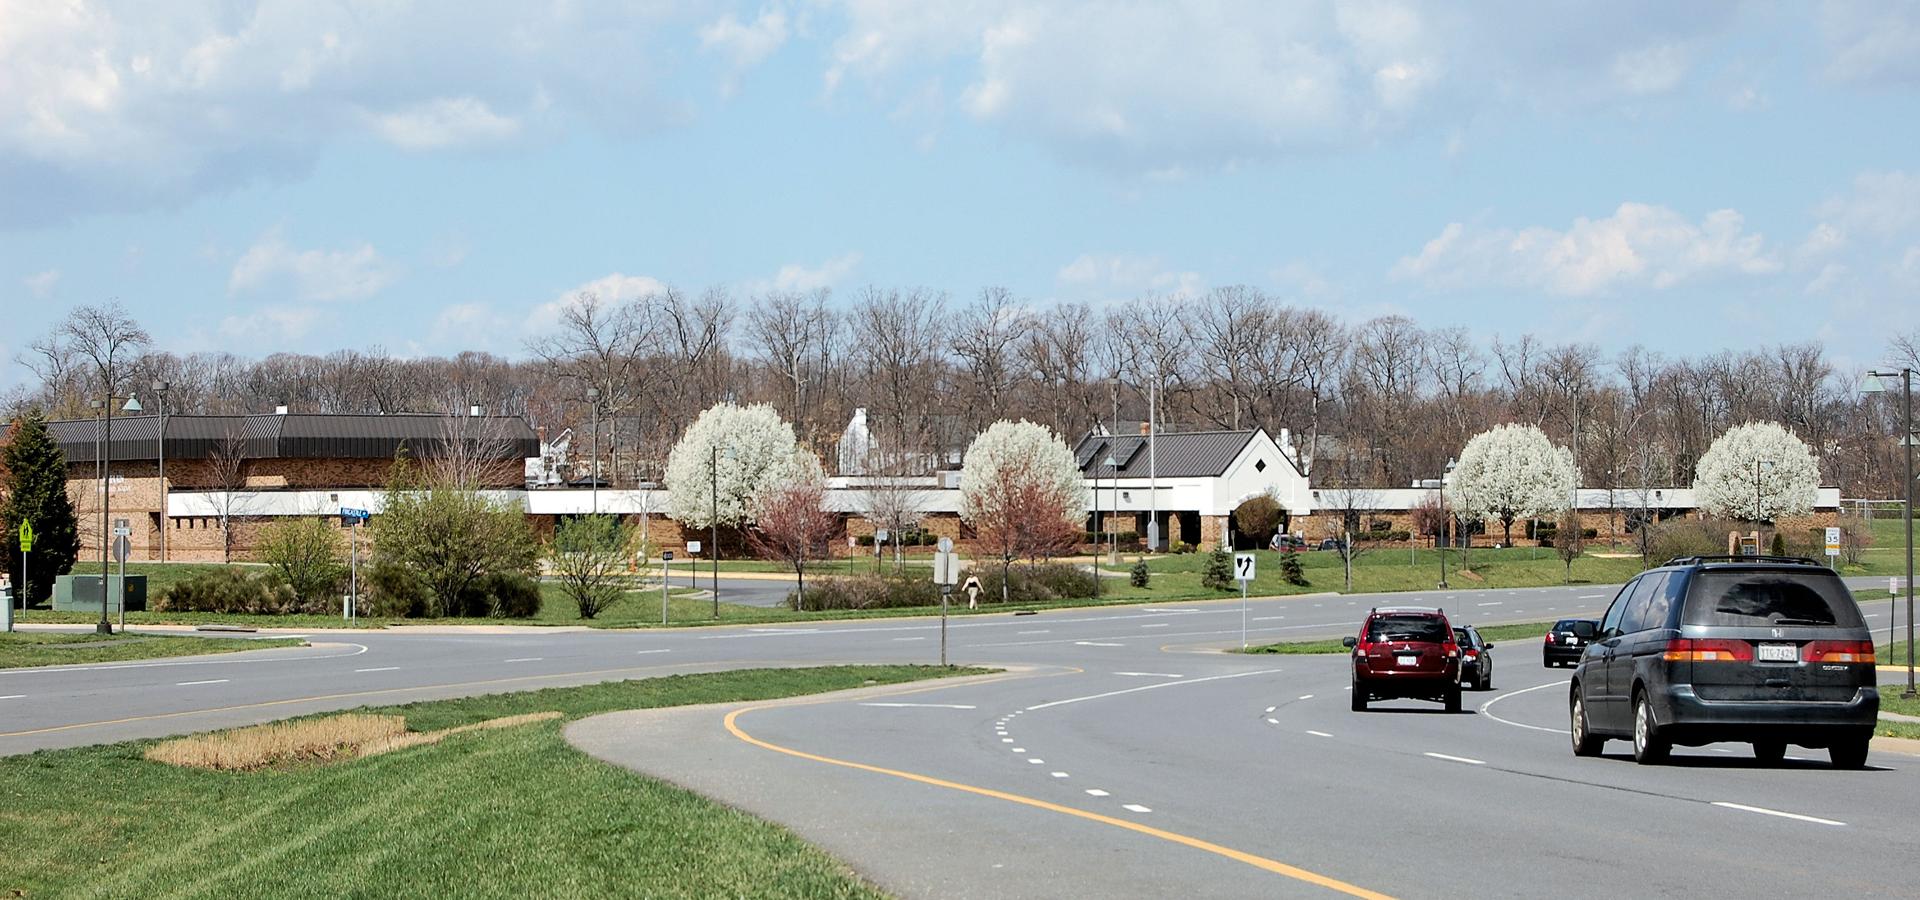 Peer-to-peer advisory in Ashburn, Virginia, USA